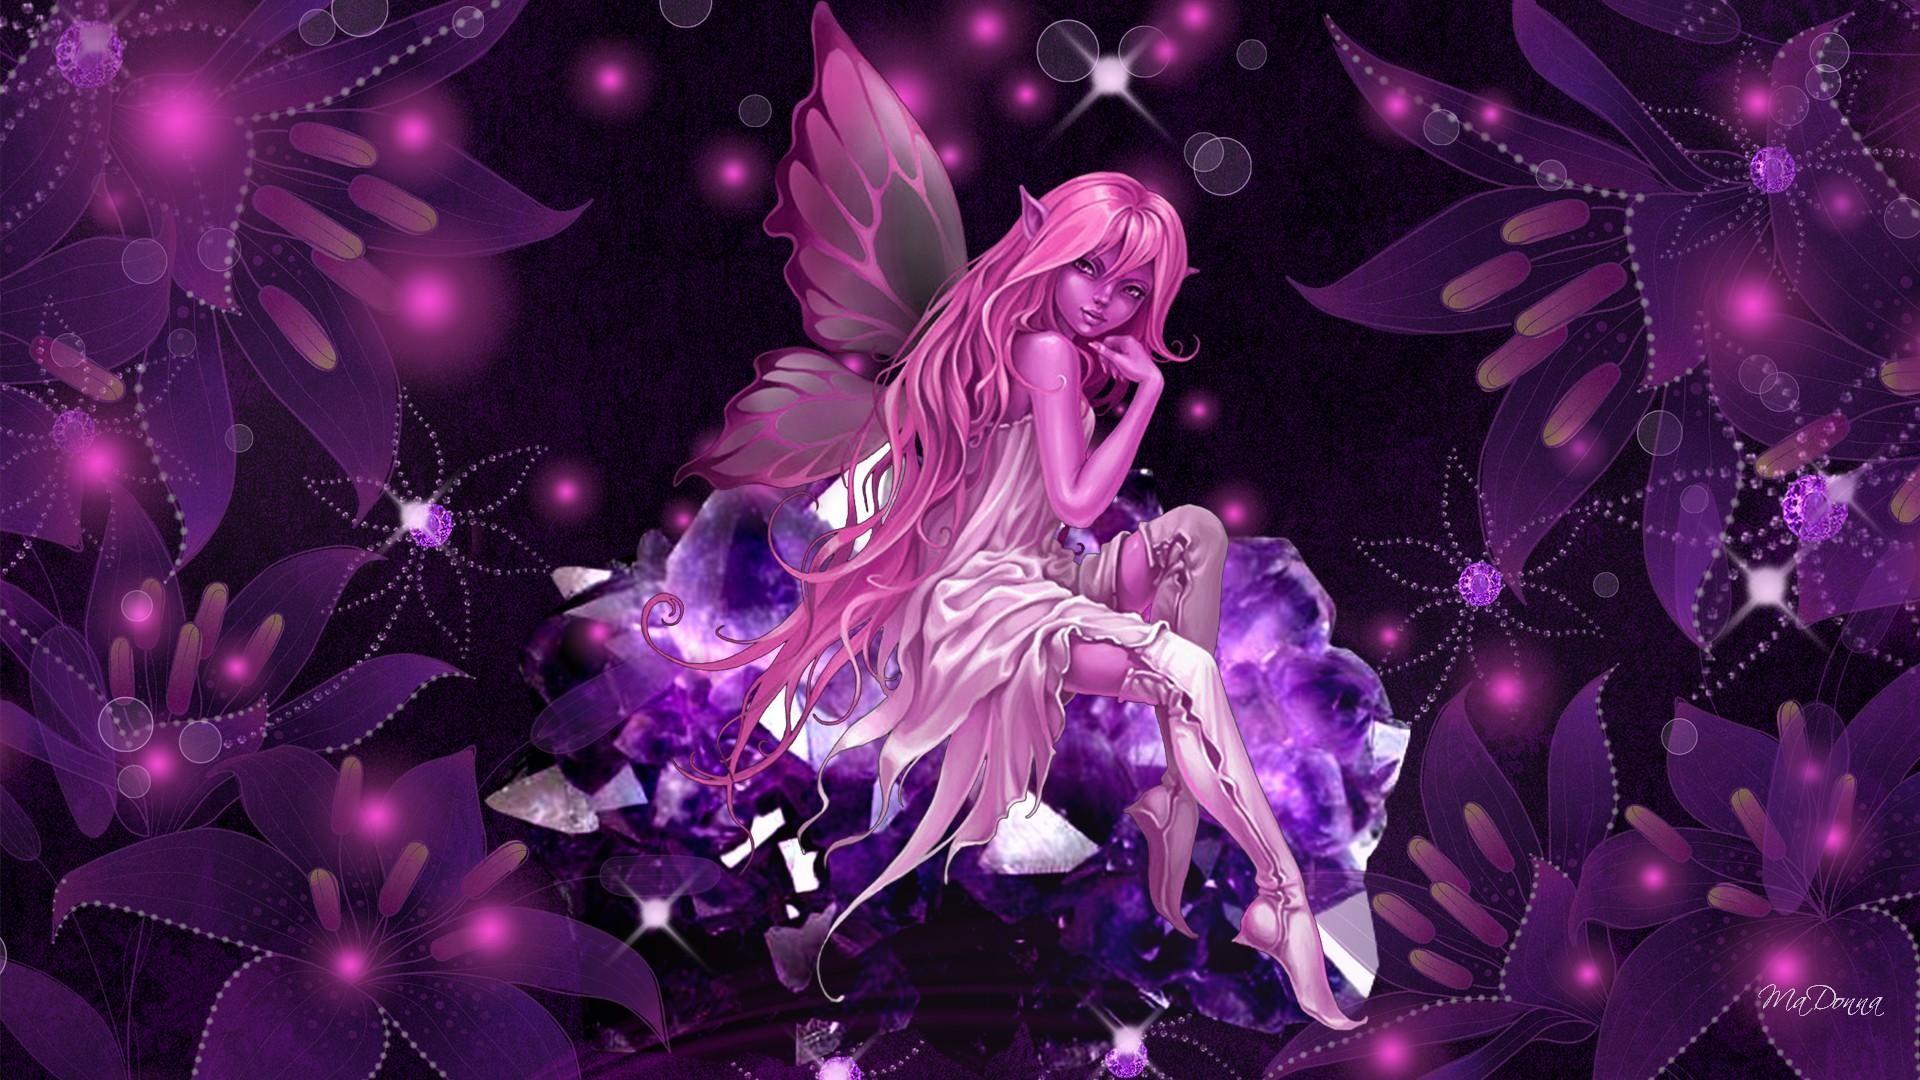 Butterfly Fairy Wallpaper   HD Pink Crystal Fairy Wallpaper